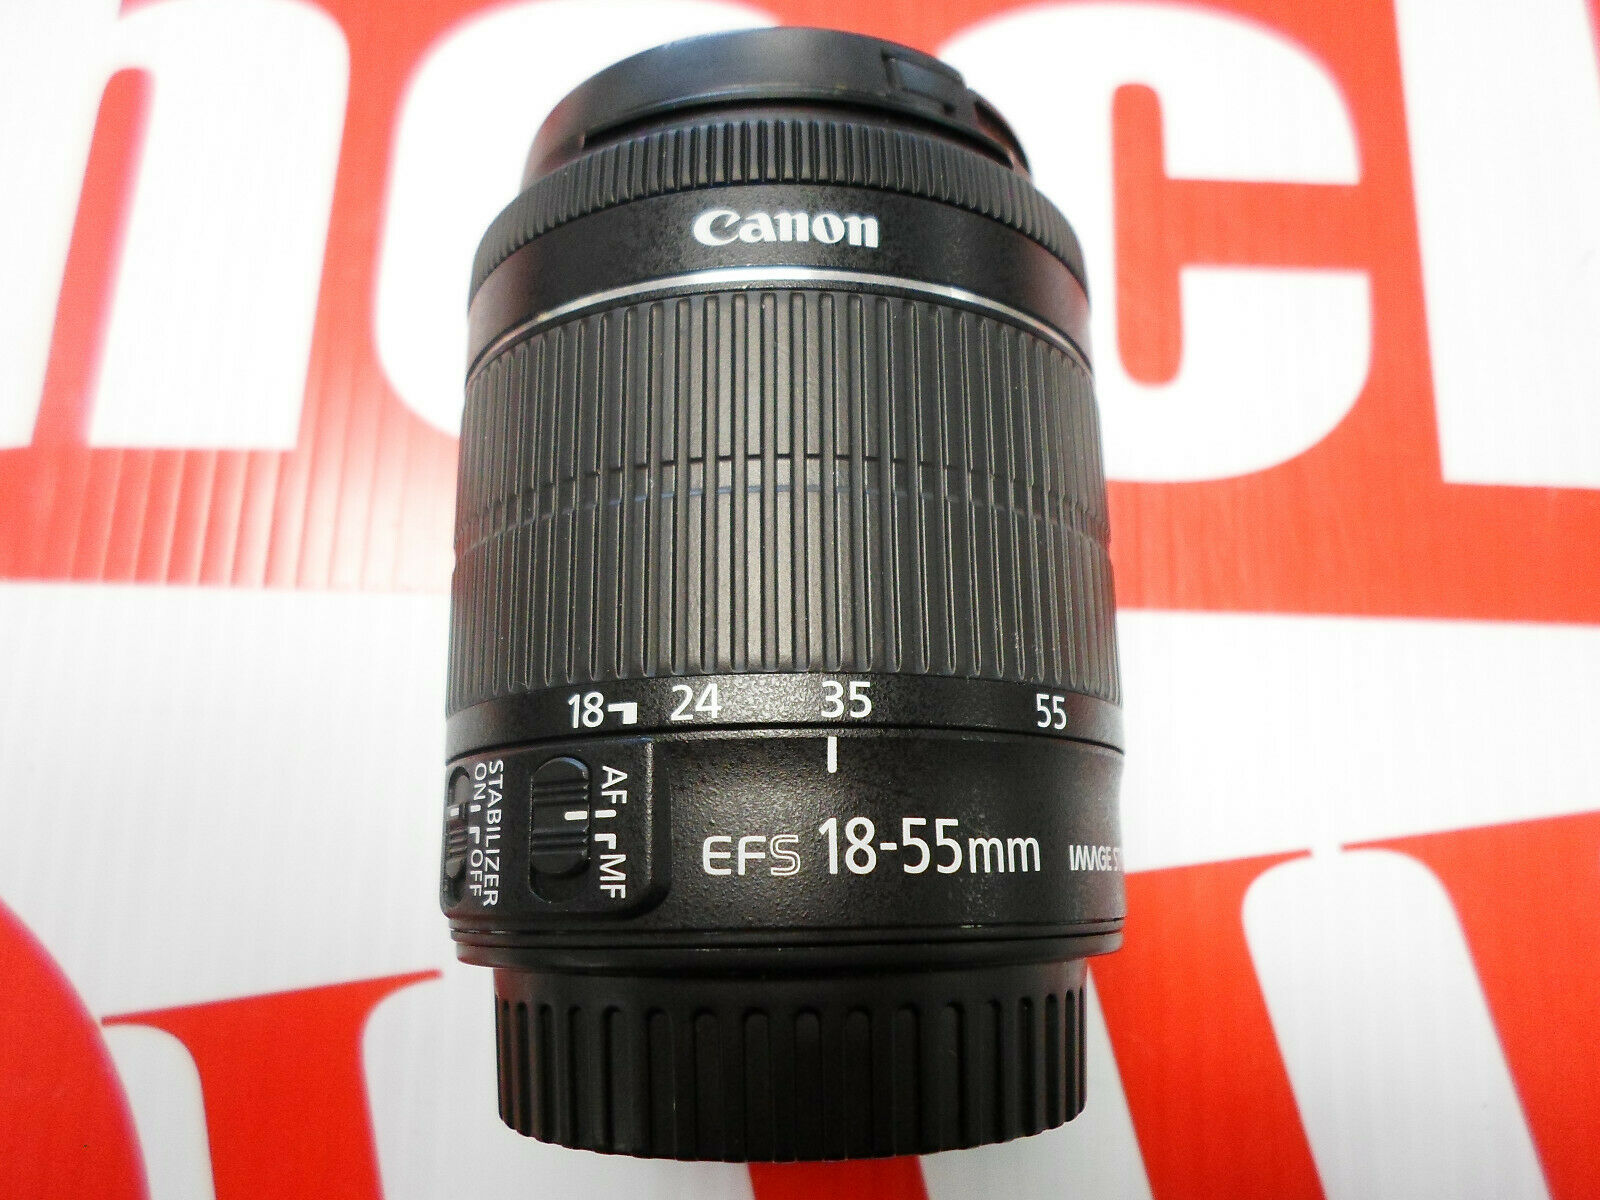 Canon EF-S 8114B002 18-55mm F/3.5-5.6 STM IS Lens - $37.00